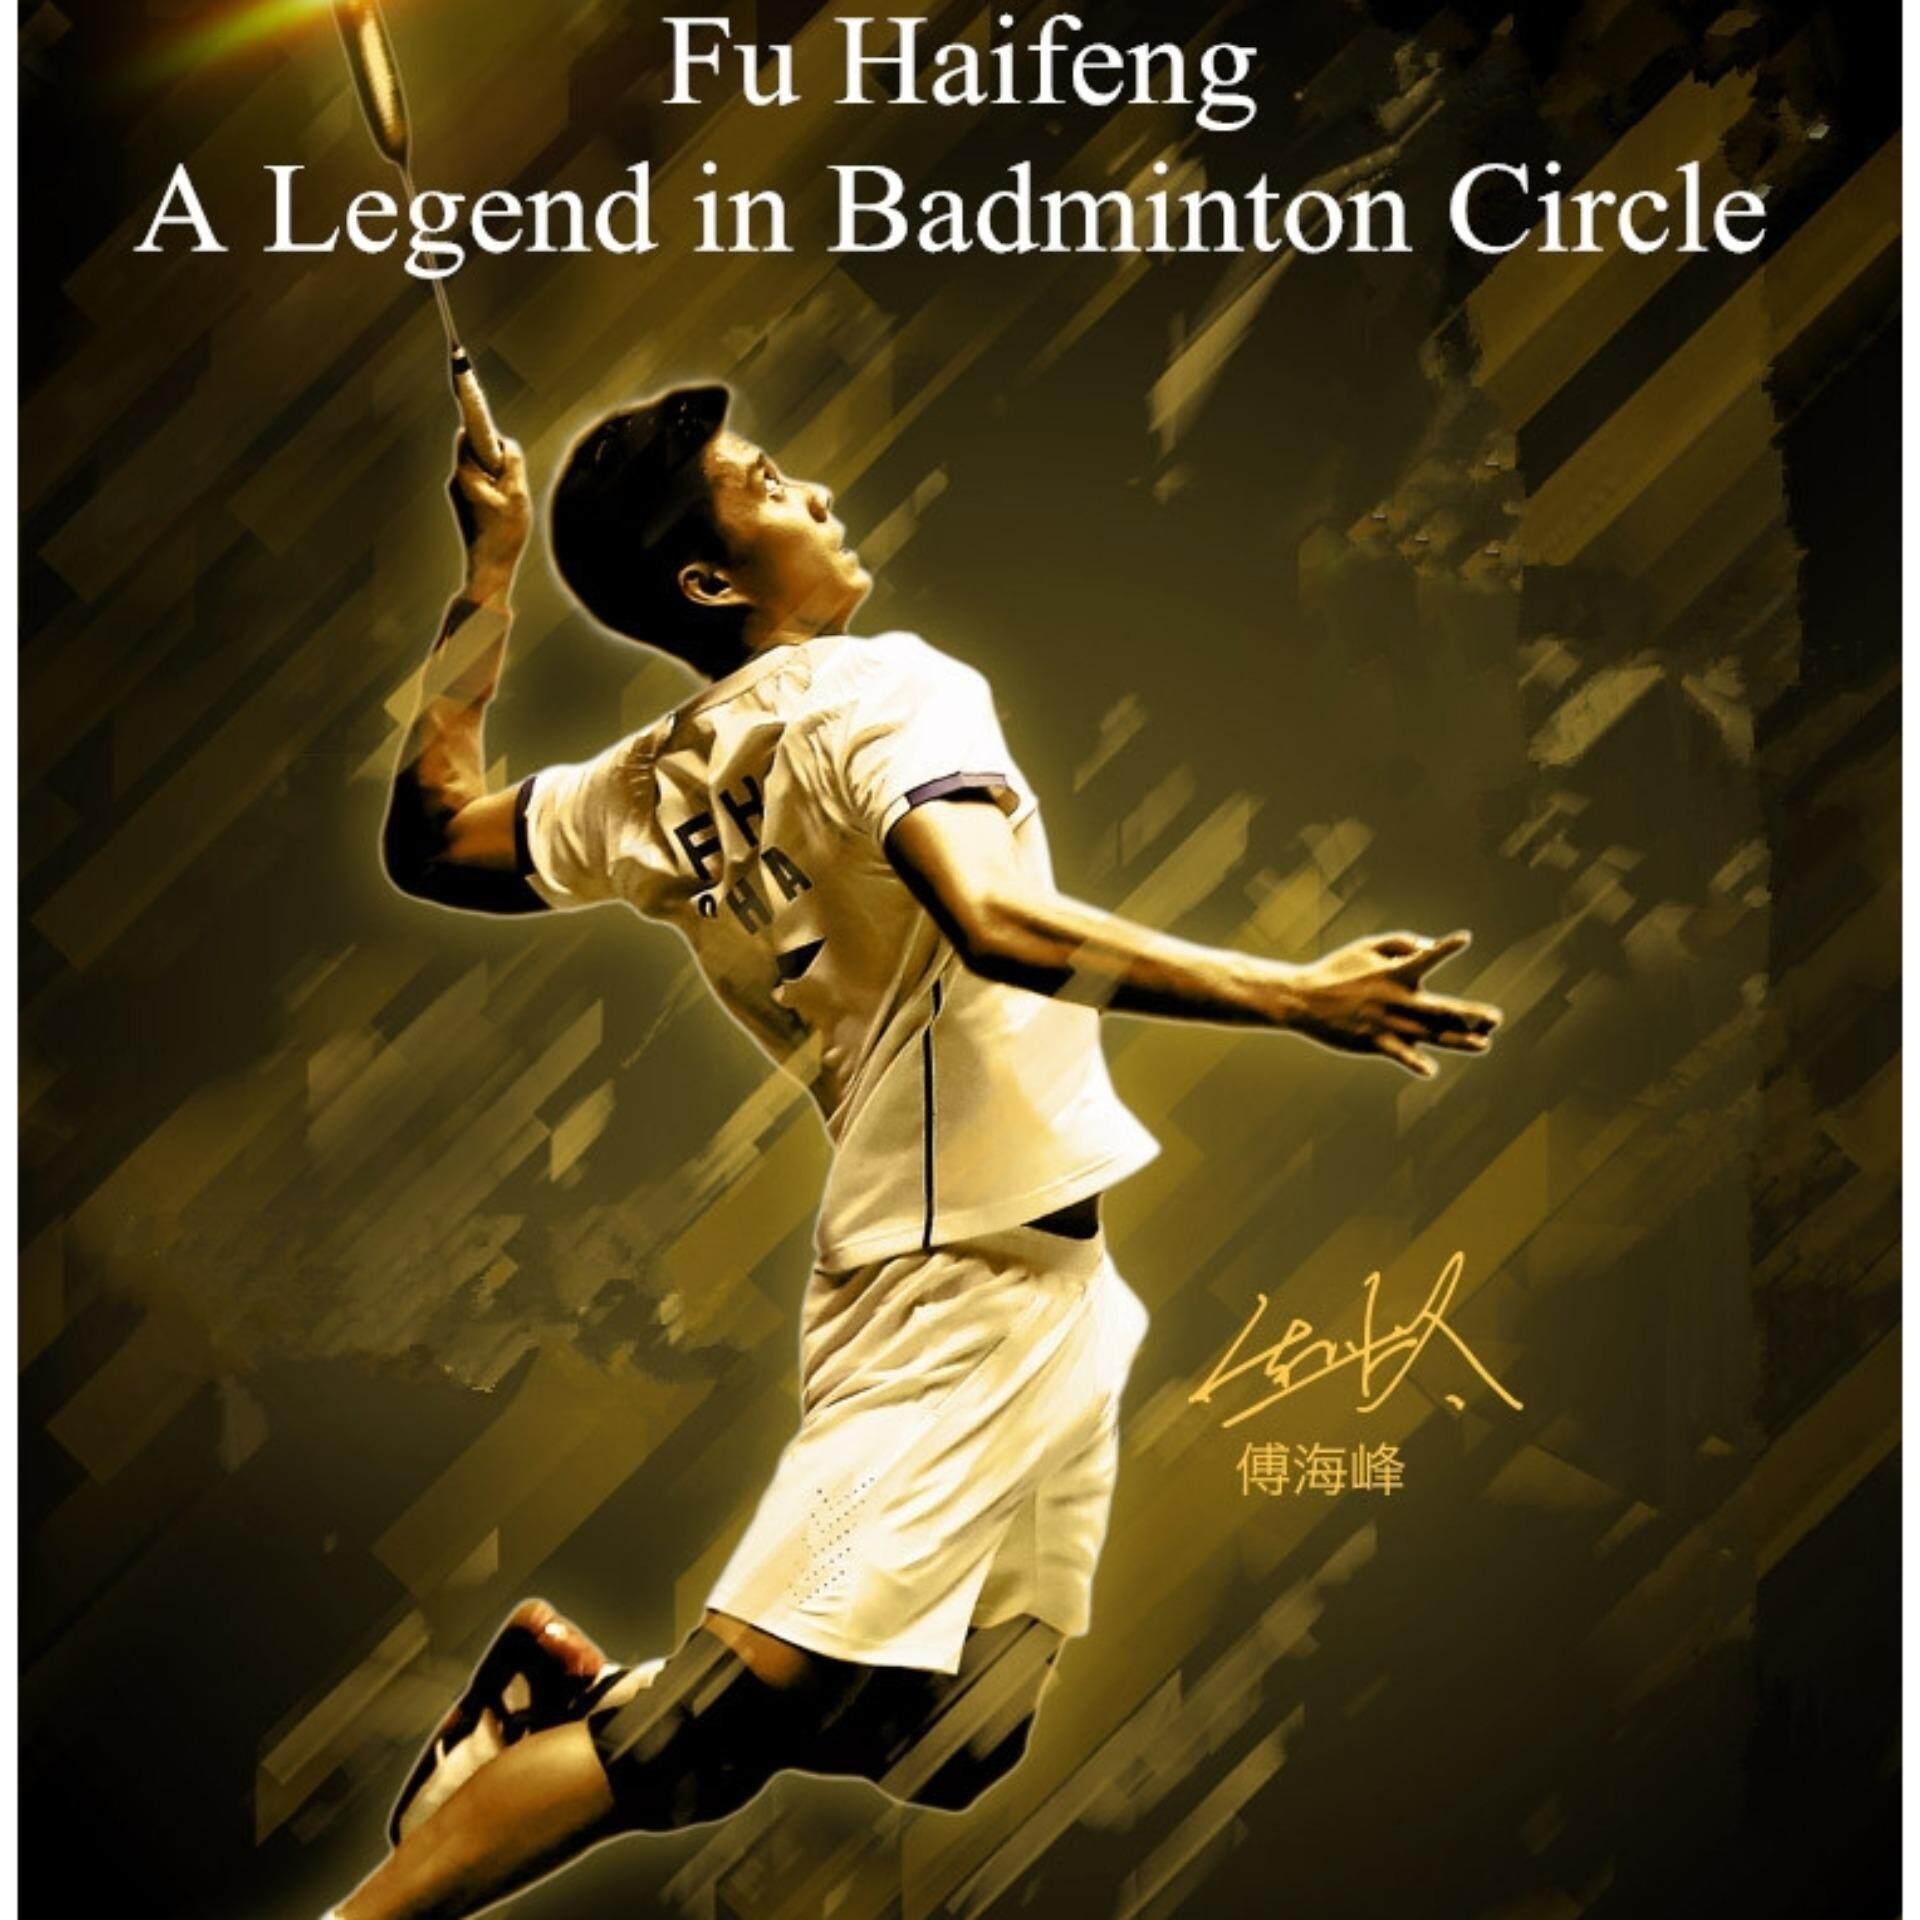 Li Ning Turbo Charging N9II Fu Hai Feng Limited Edition @ 7in1 Yonex Package Lining (Top Grade Quality)